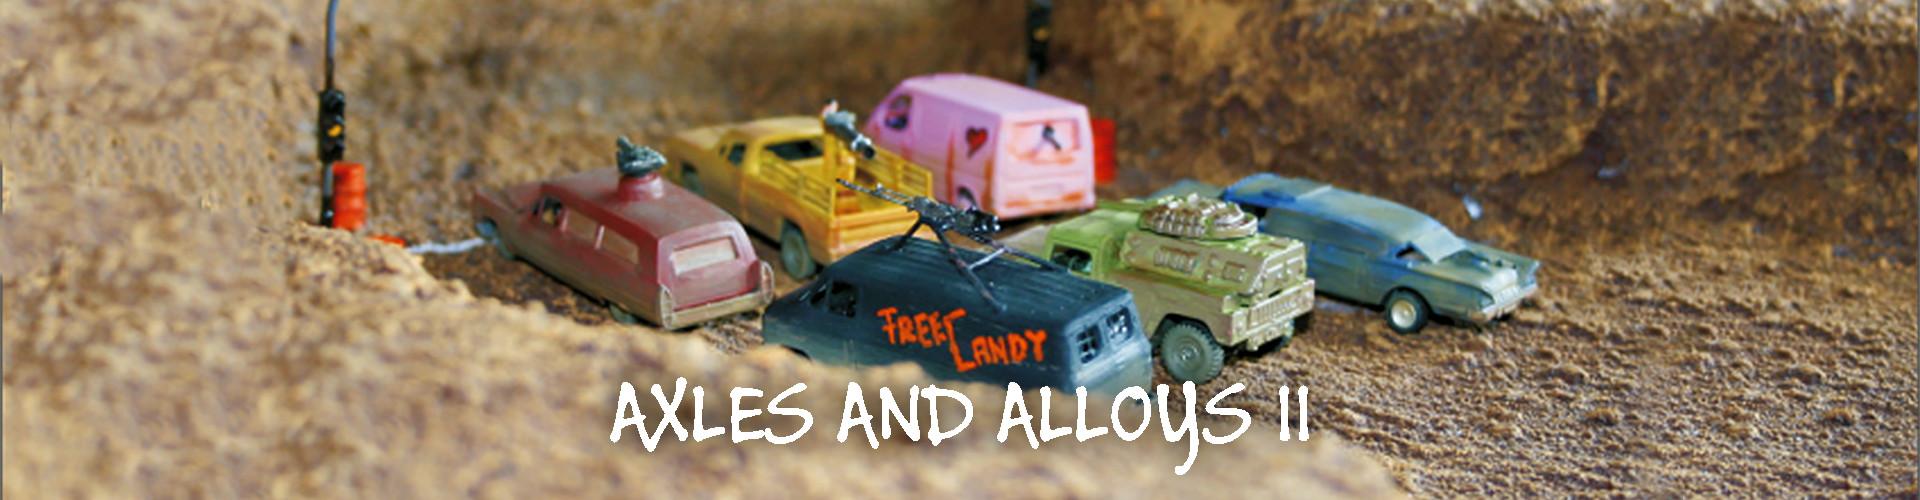 DEMO 04 Axles and Alloys2 - Demospiele: AXLES & ALLOYS 2